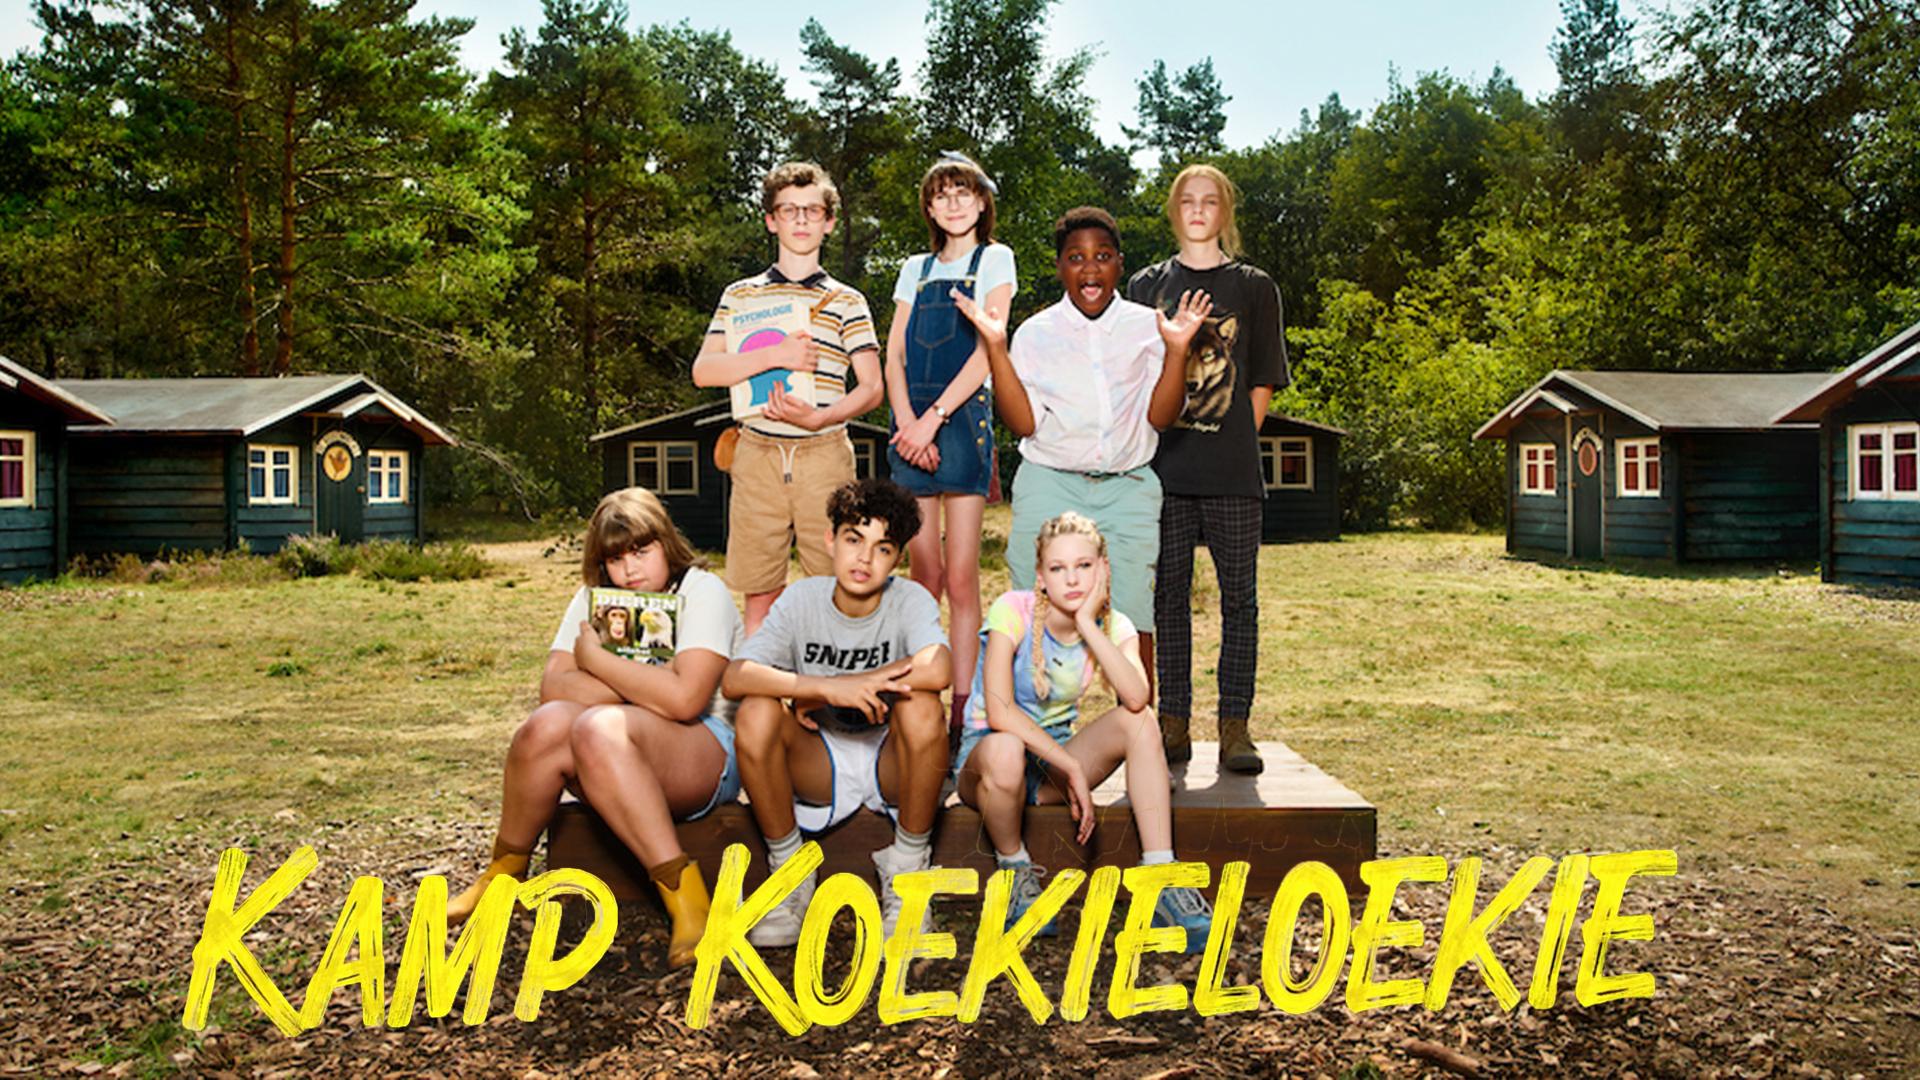 Video: Kamp Koekieloekie teaser met audiodescriptie.